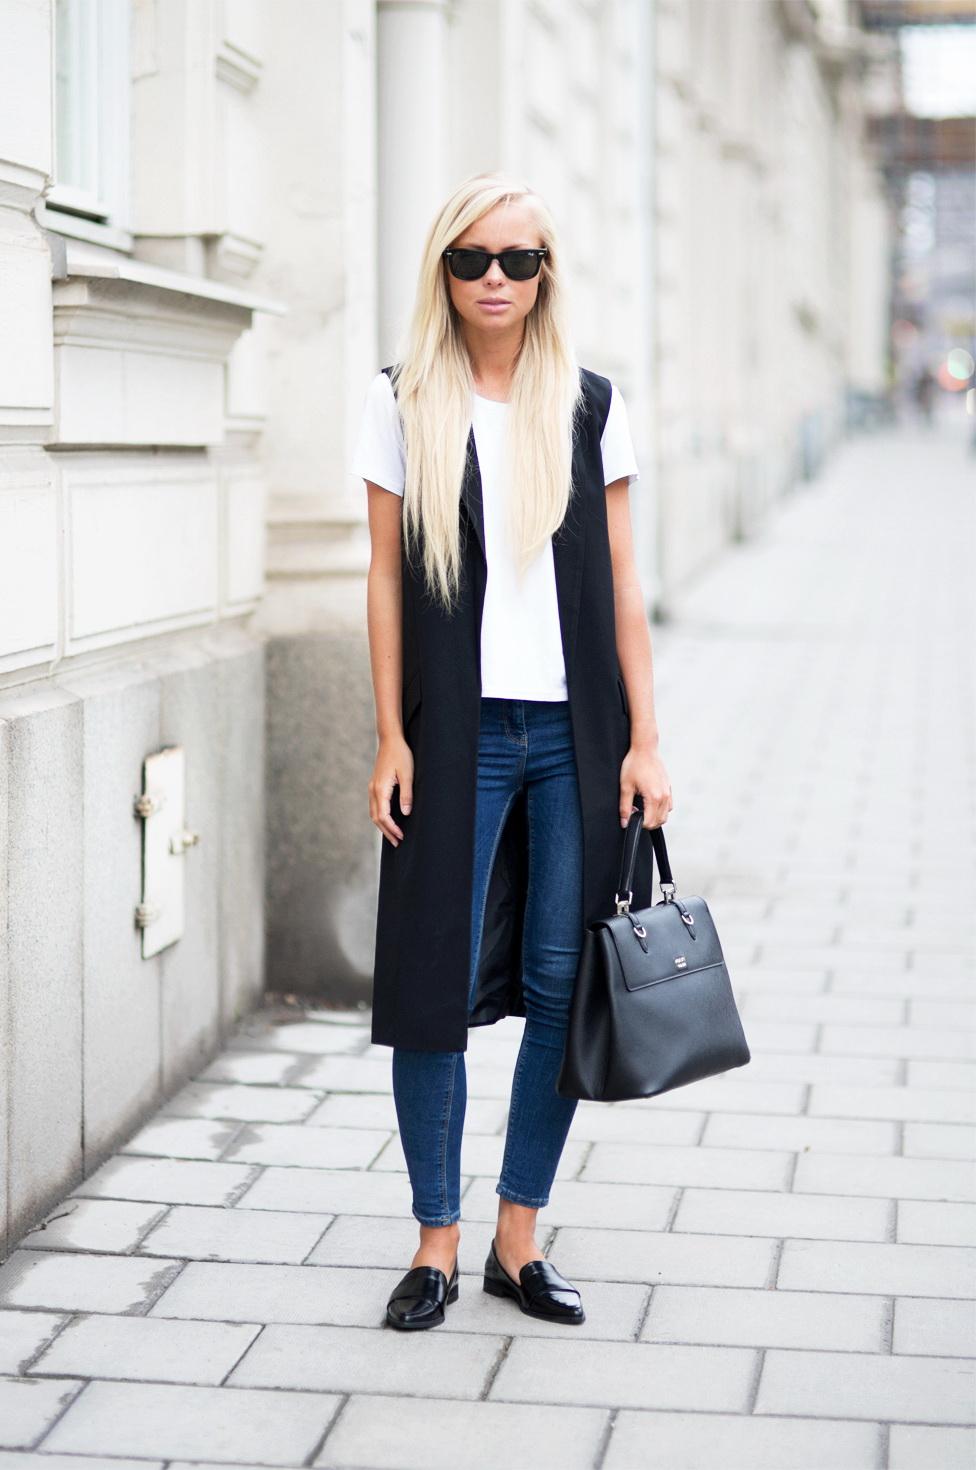 Denim-Skinny-Jeans-2016-Street-Style-2